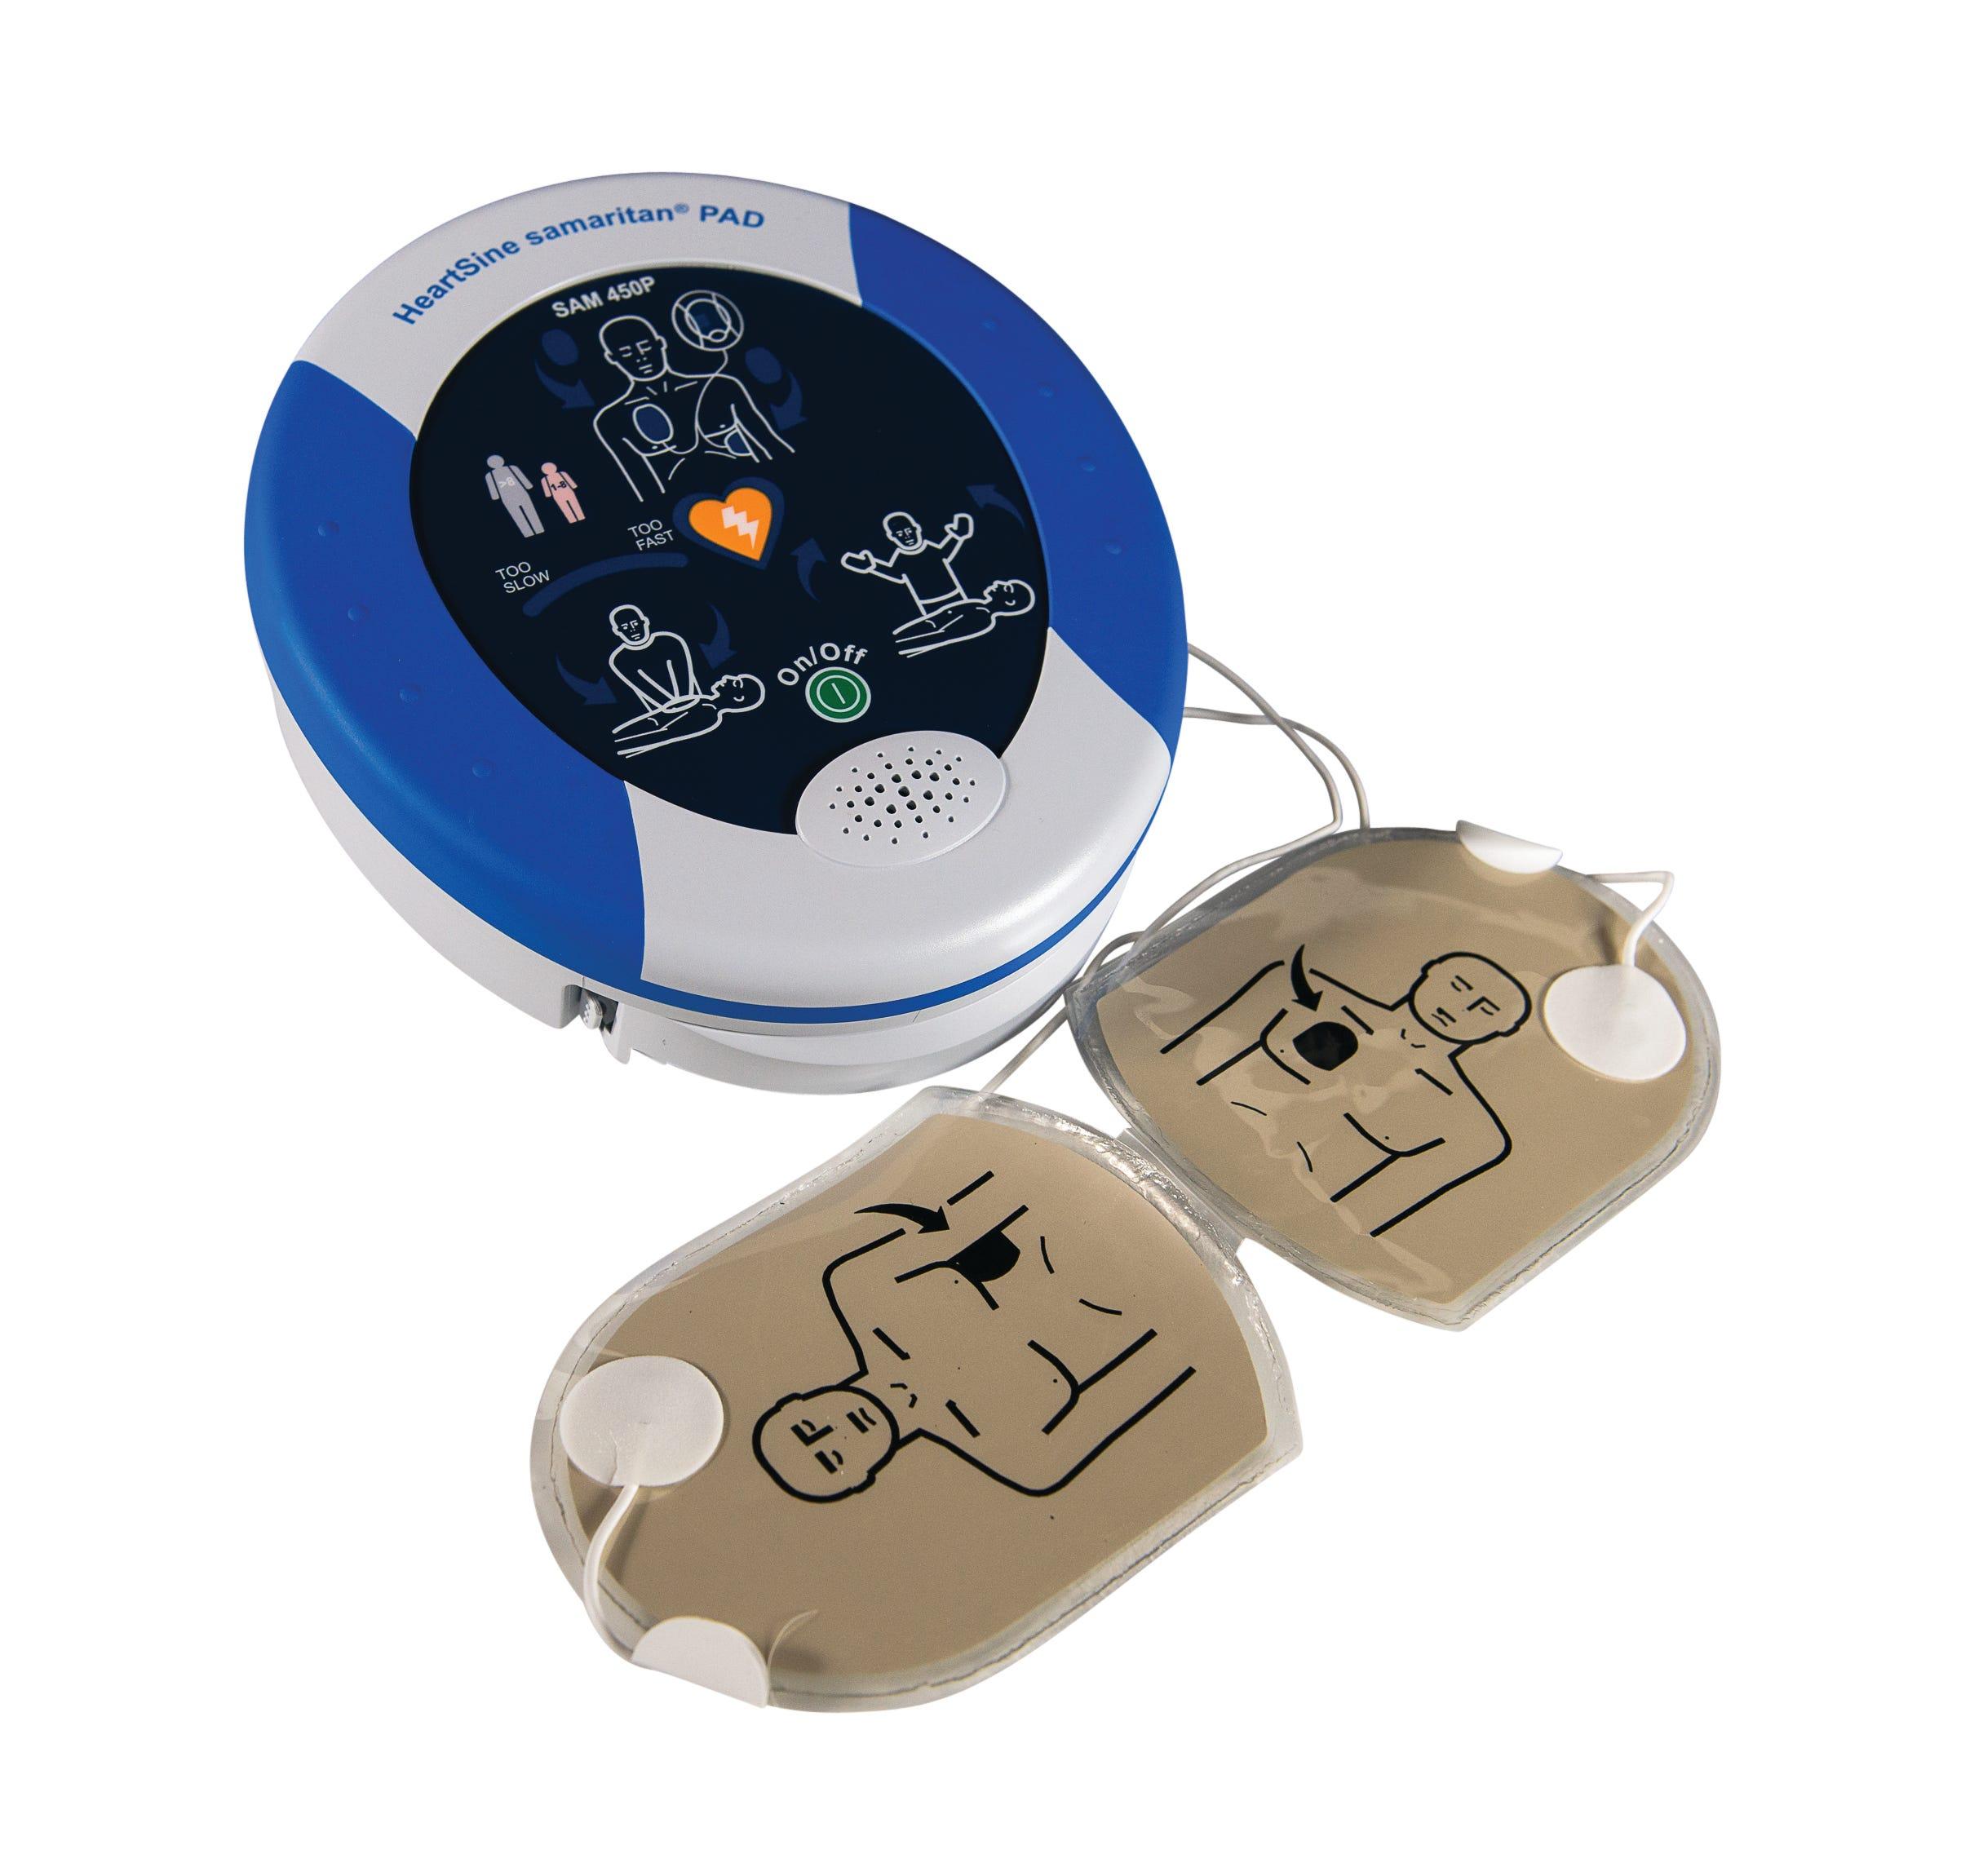 Heartsine Samaritan Pads and Batteries